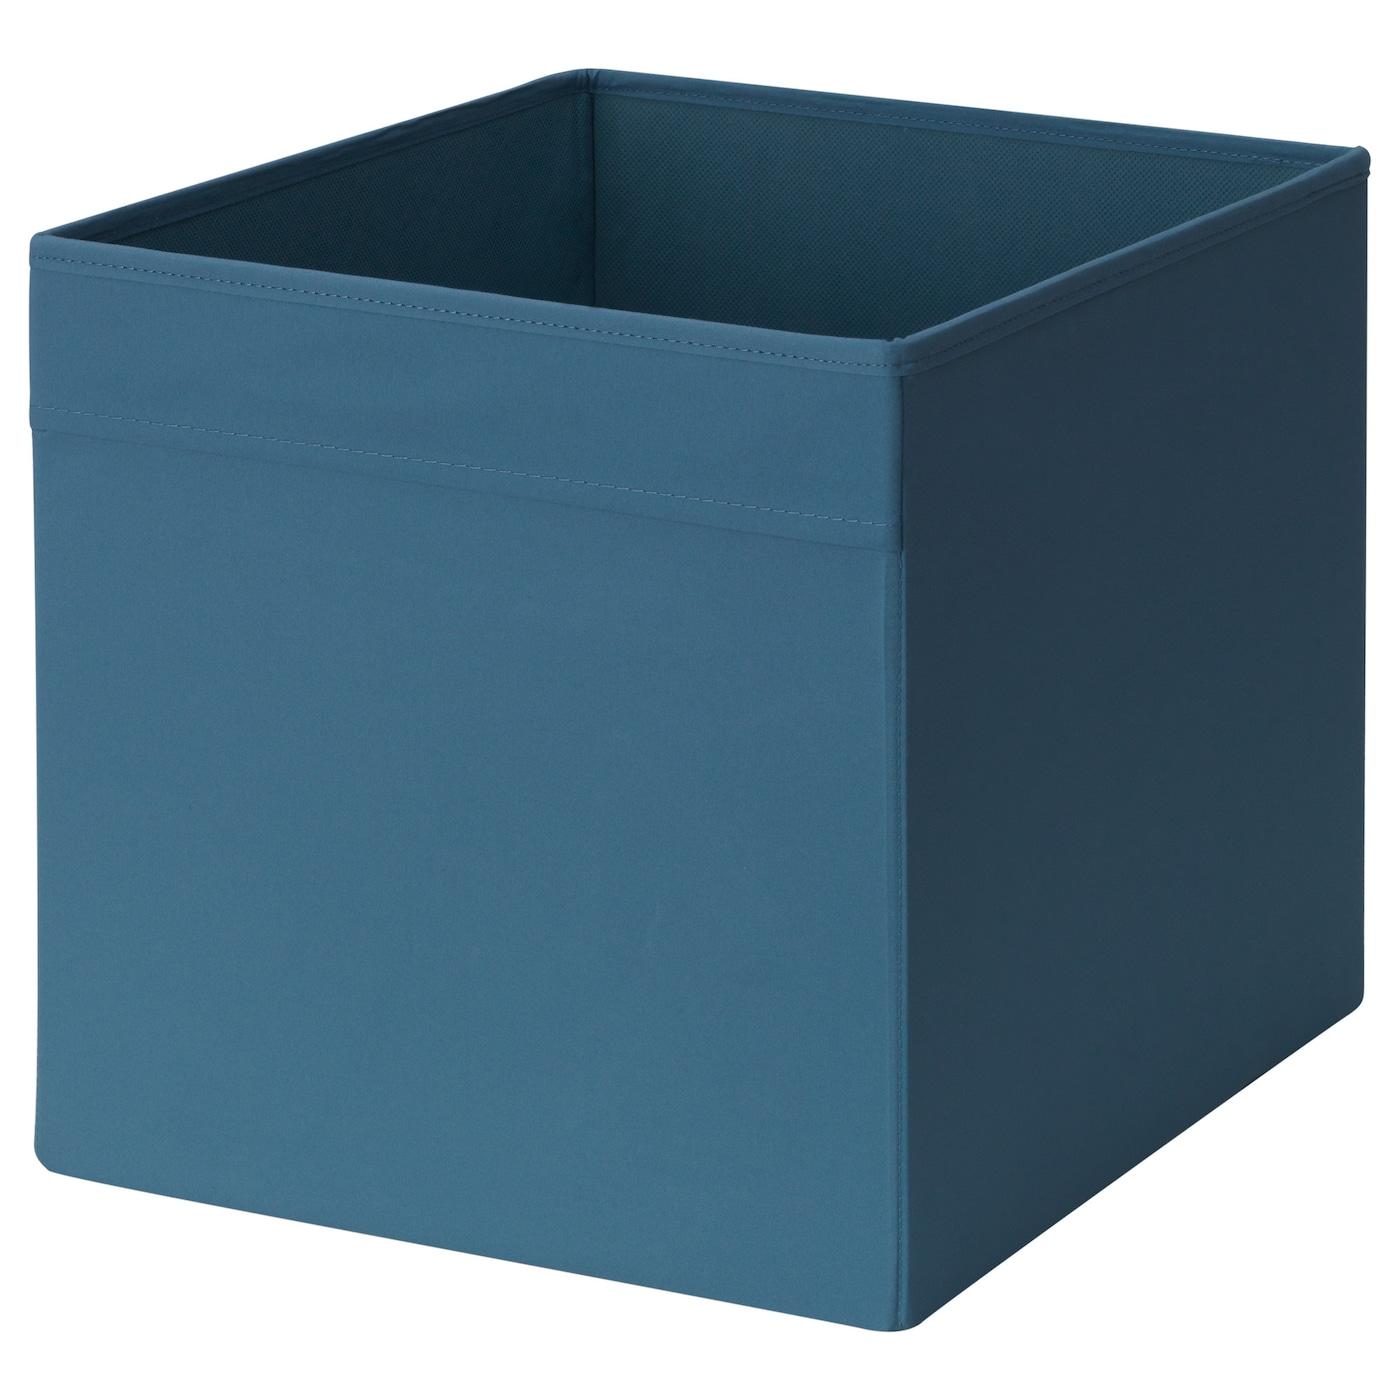 Storage Boxes & Storage Baskets | IKEA